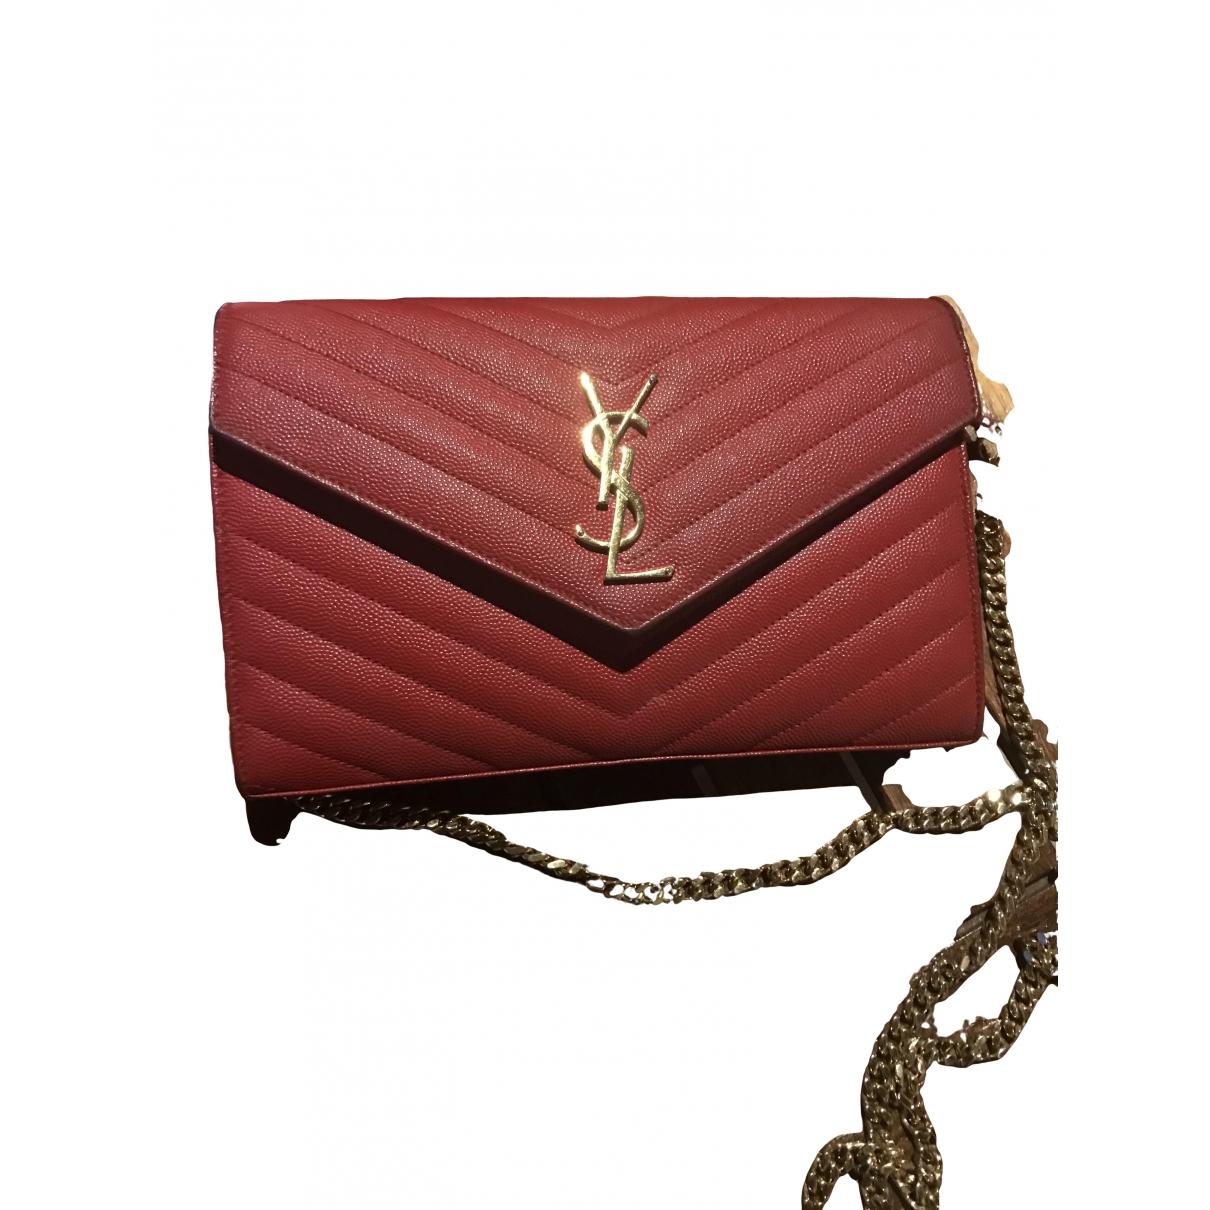 Saint Laurent Portefeuille enveloppe monogram Red Leather Clutch bag for Women \N